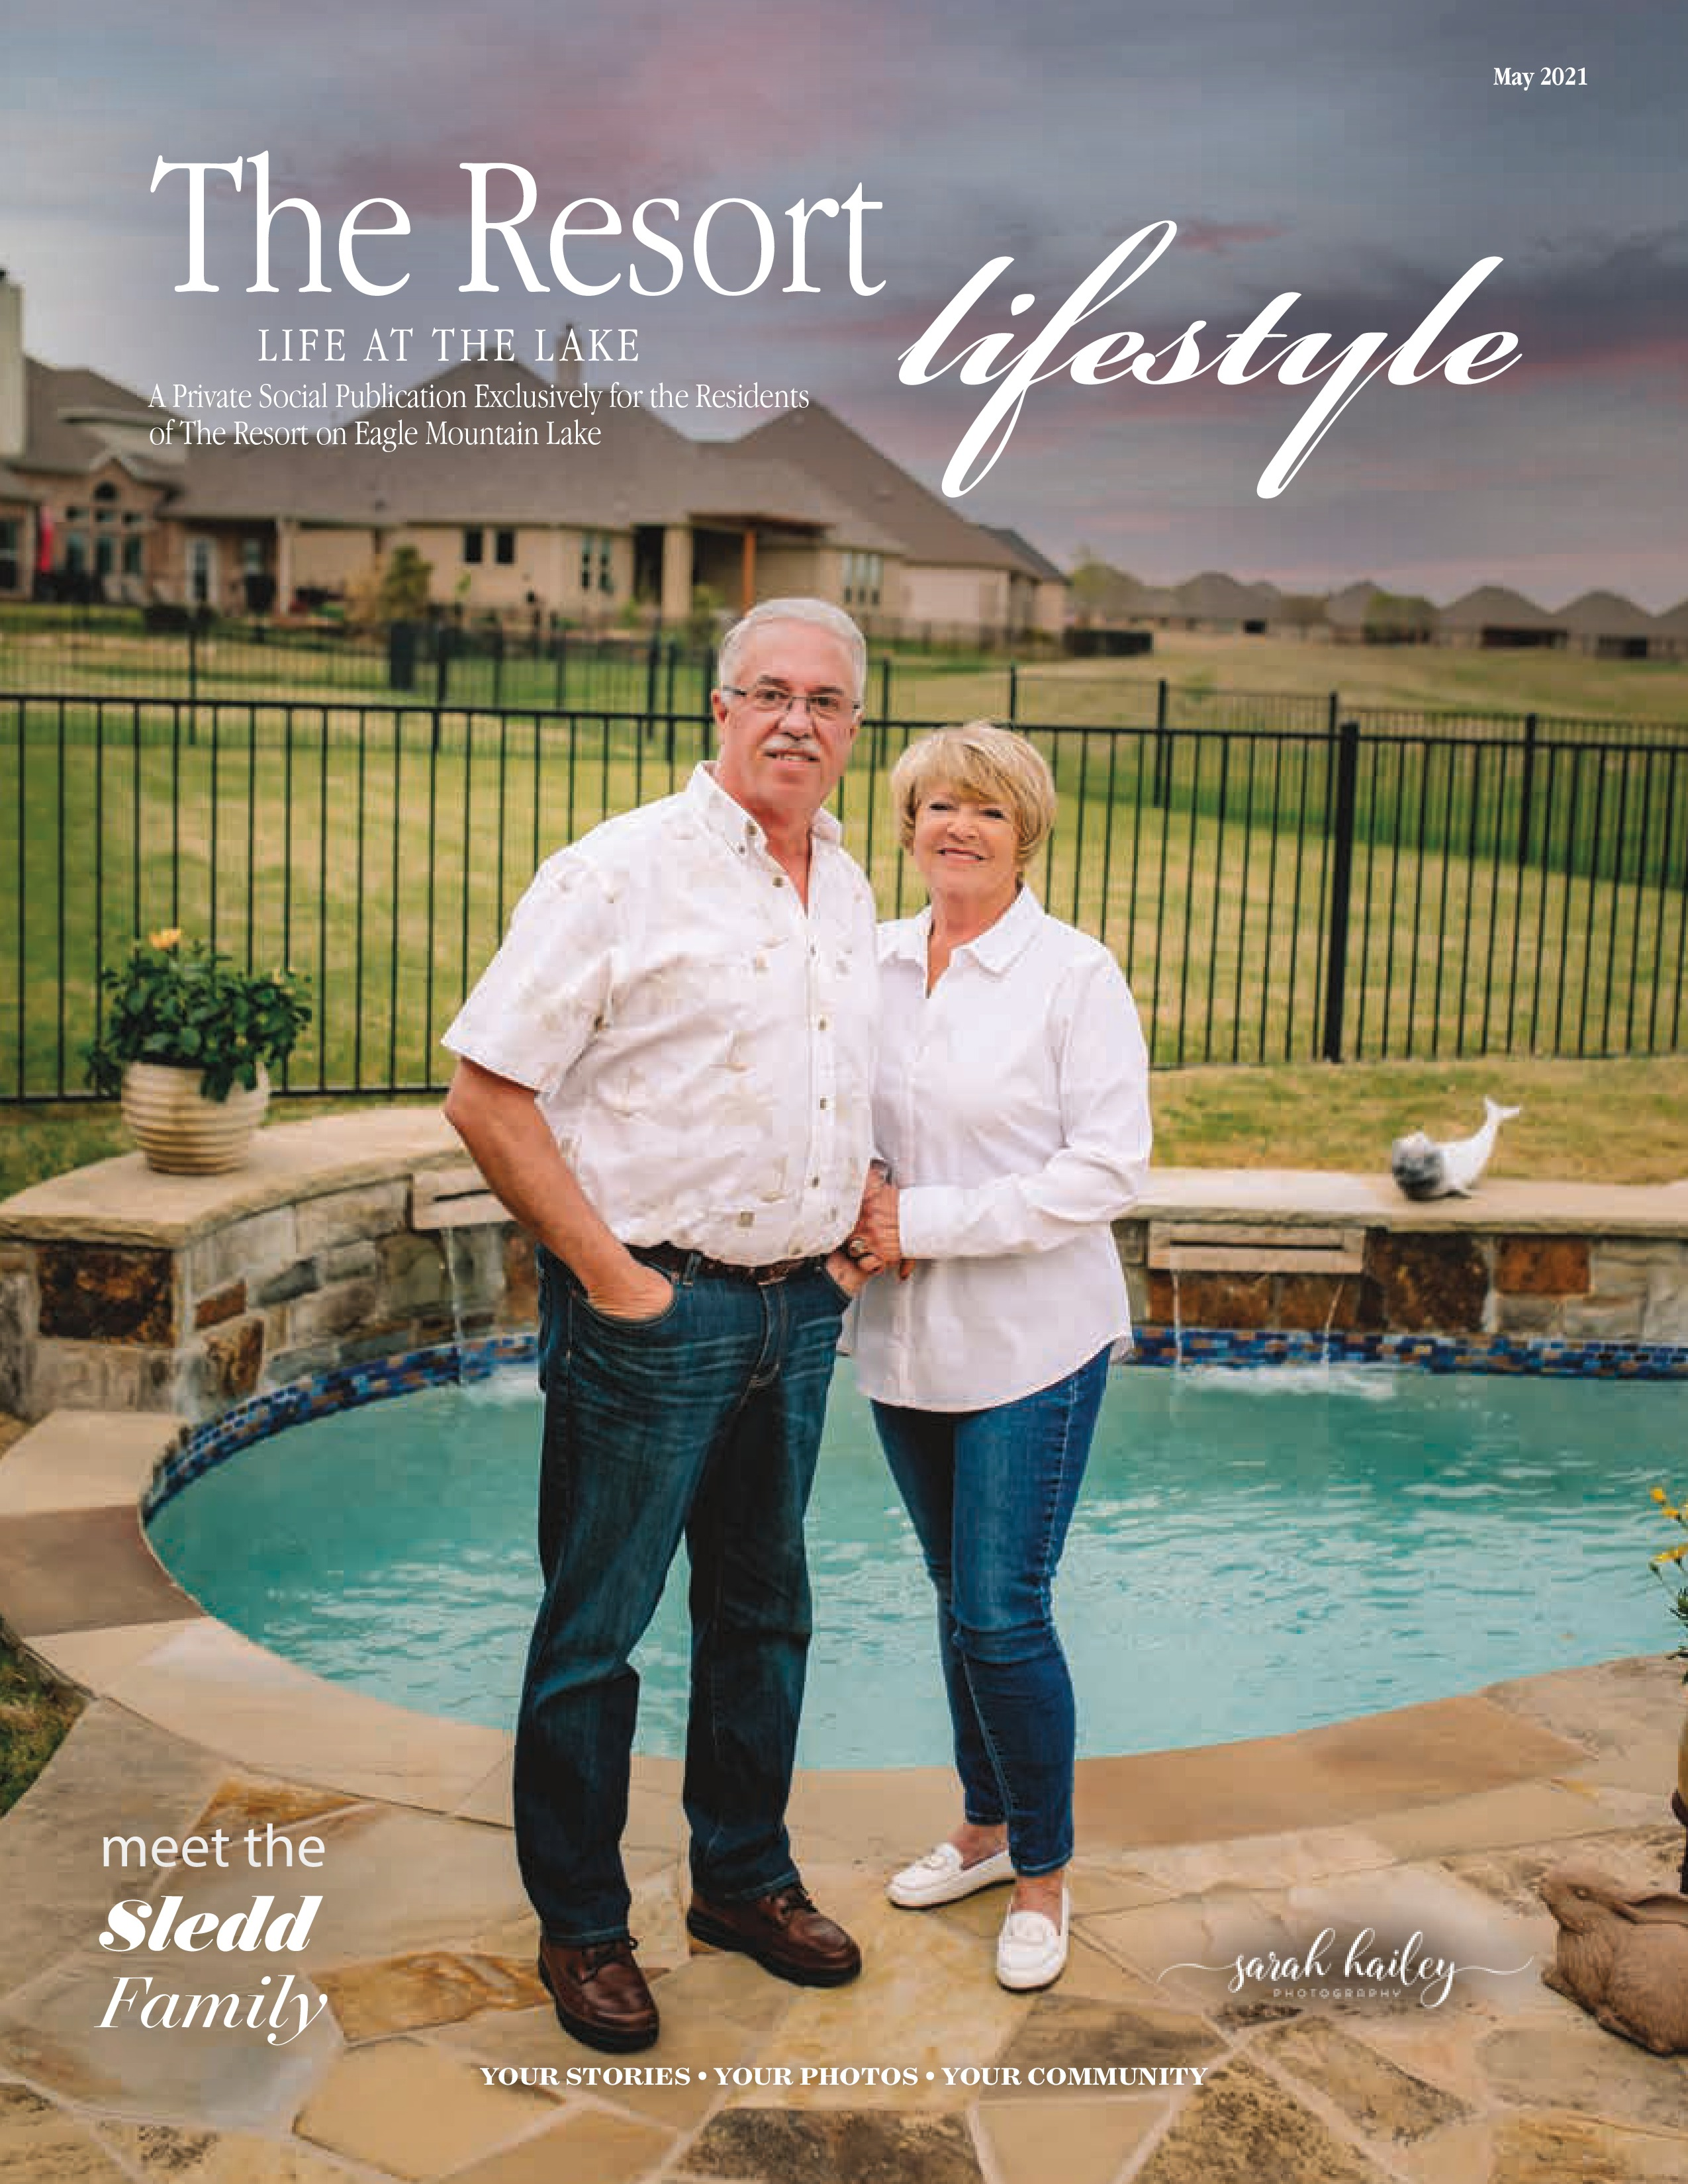 The Resort Lifestyle 2021-05-01